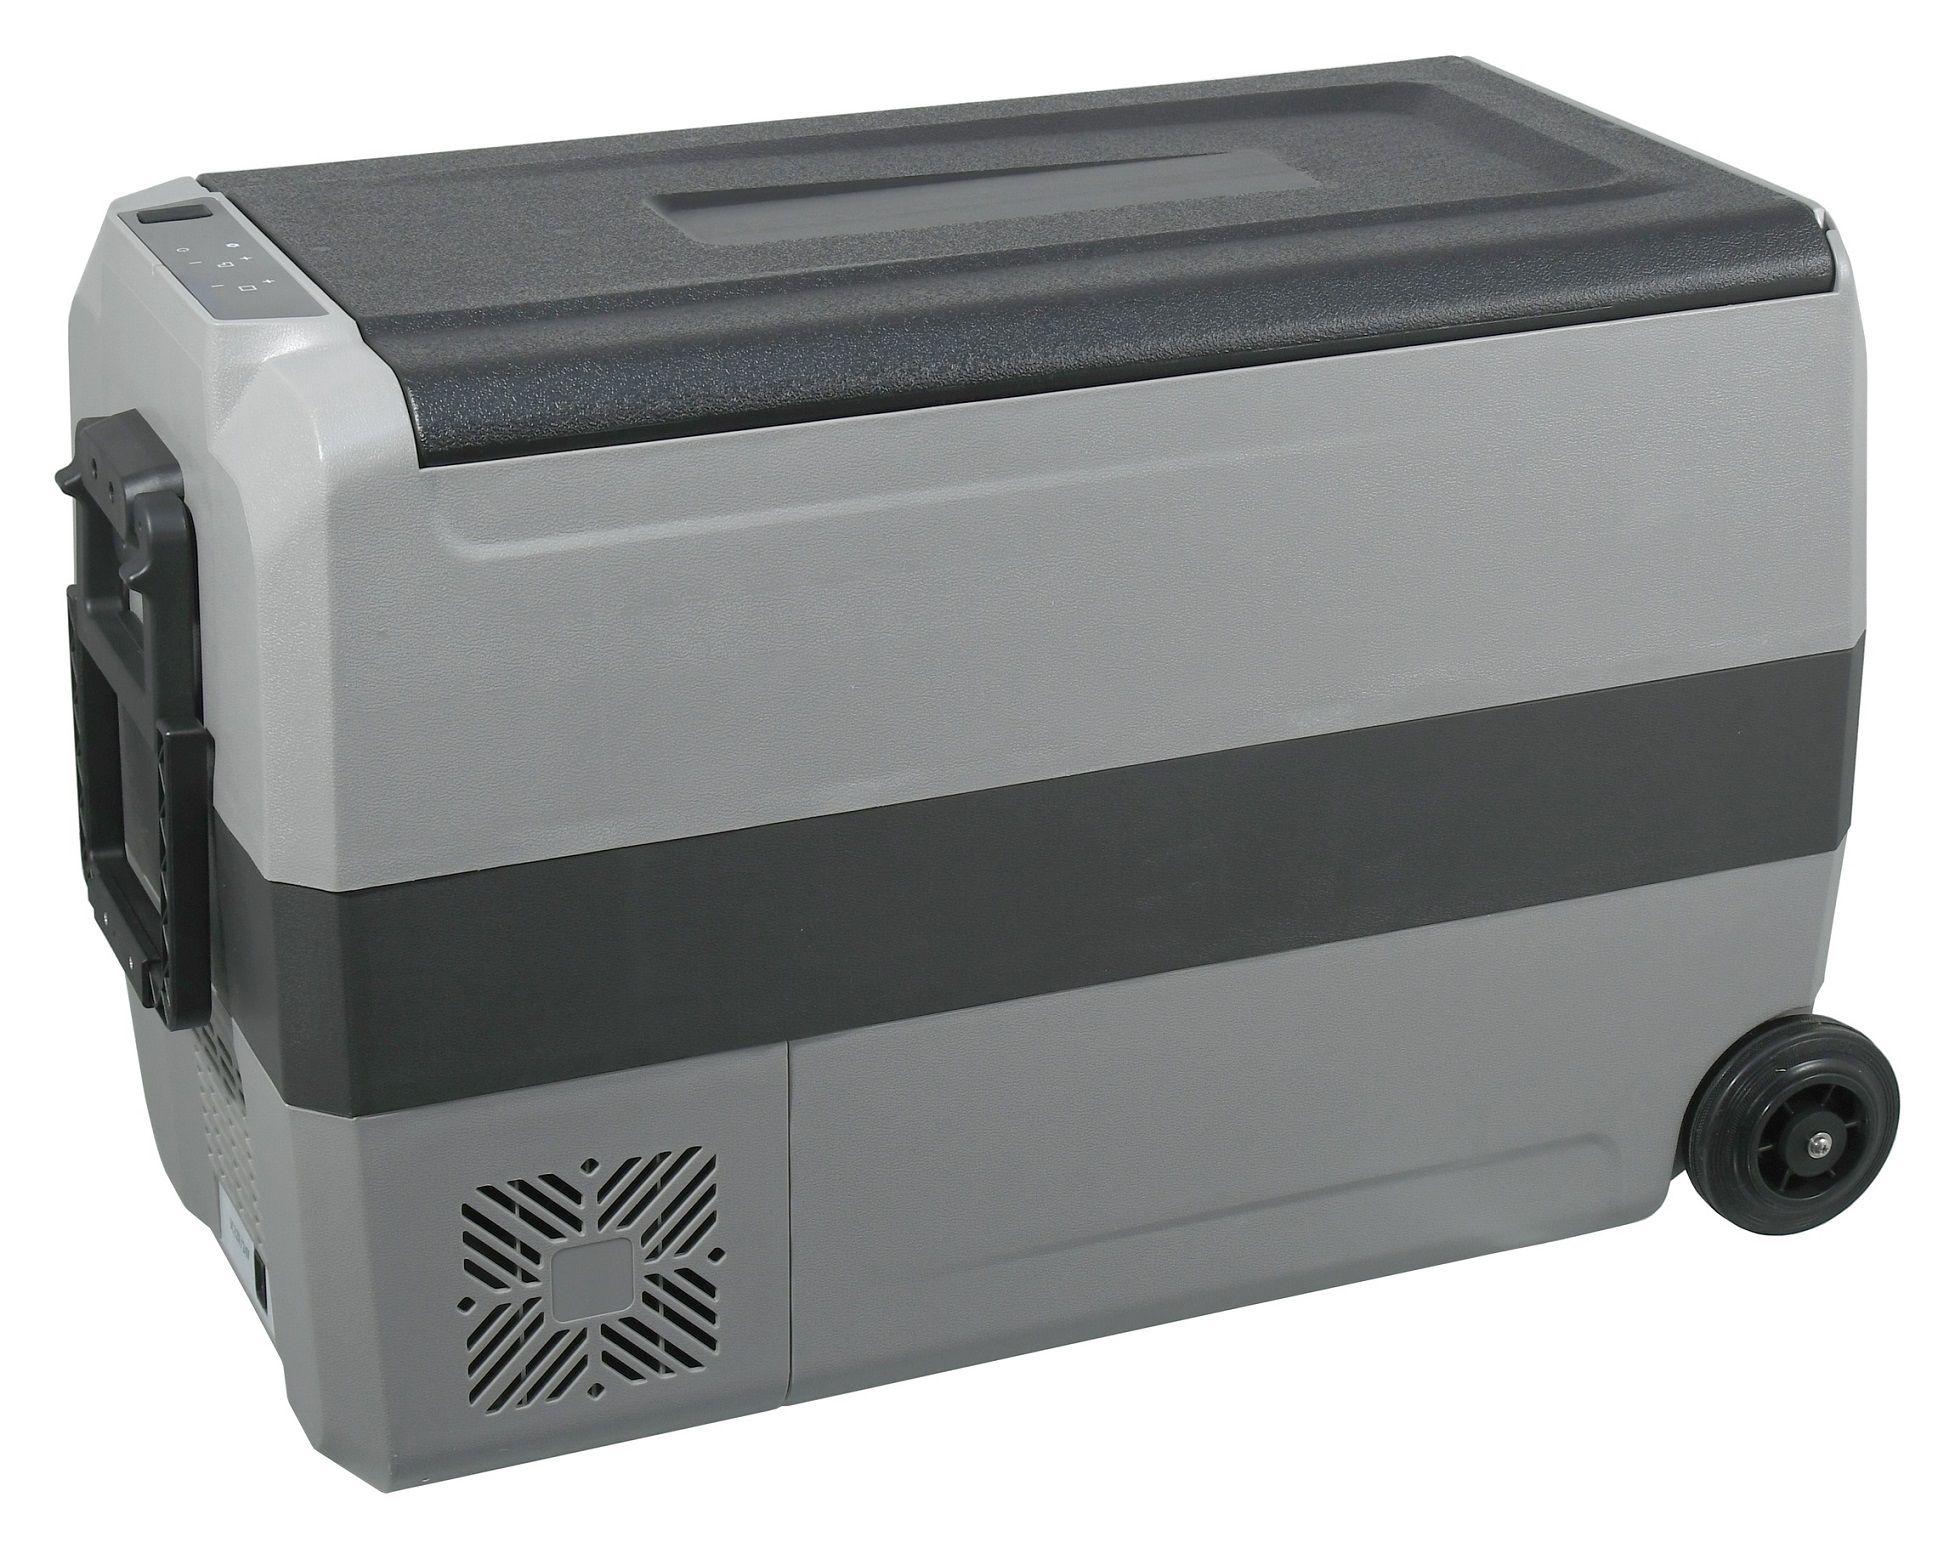 Chladící box DUAL kompresor 50l 230/24/12V -20°C COMPASS